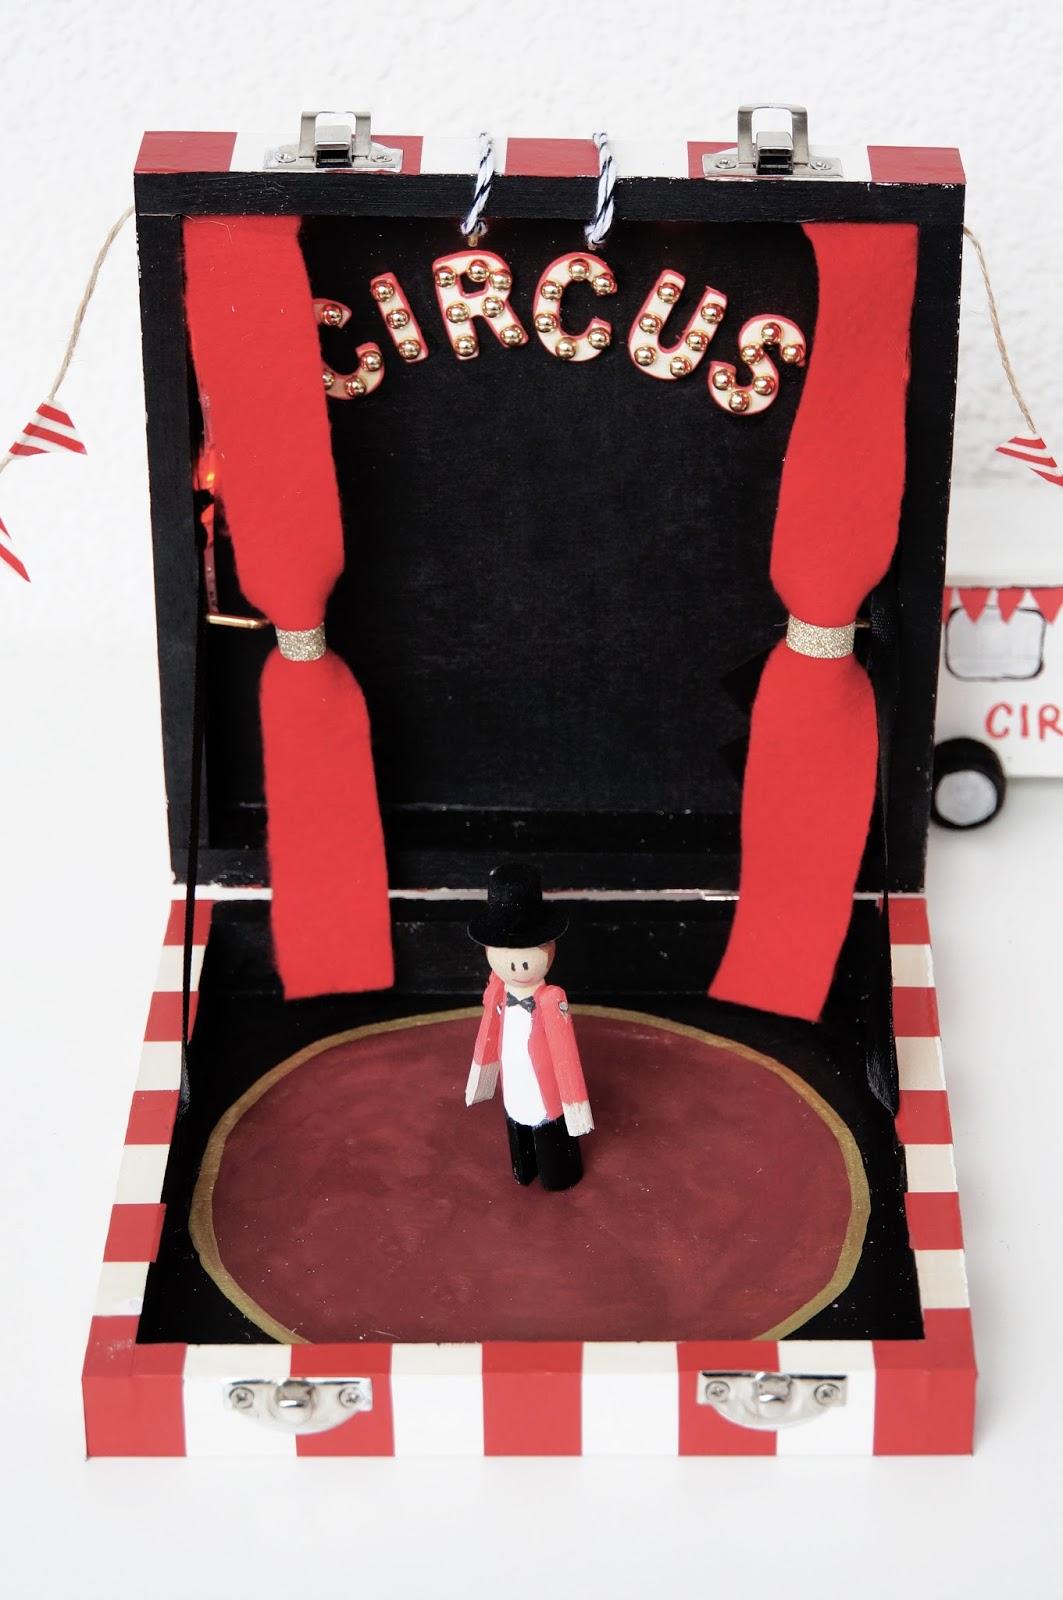 Basteln Malen Kuchen Backen Zirkus